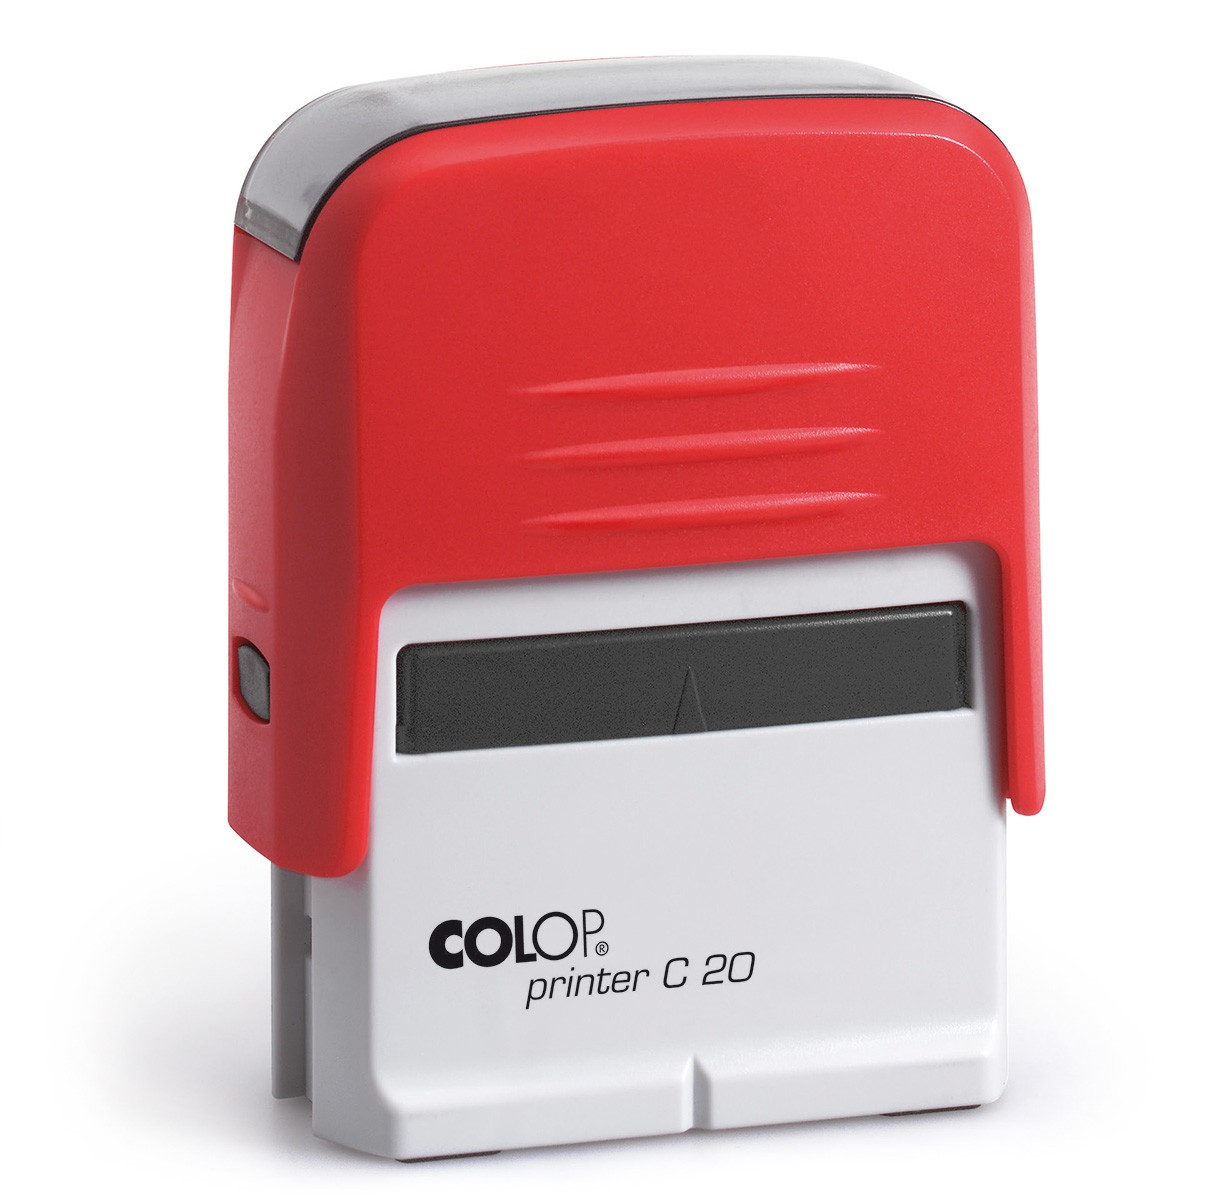 Printer C20